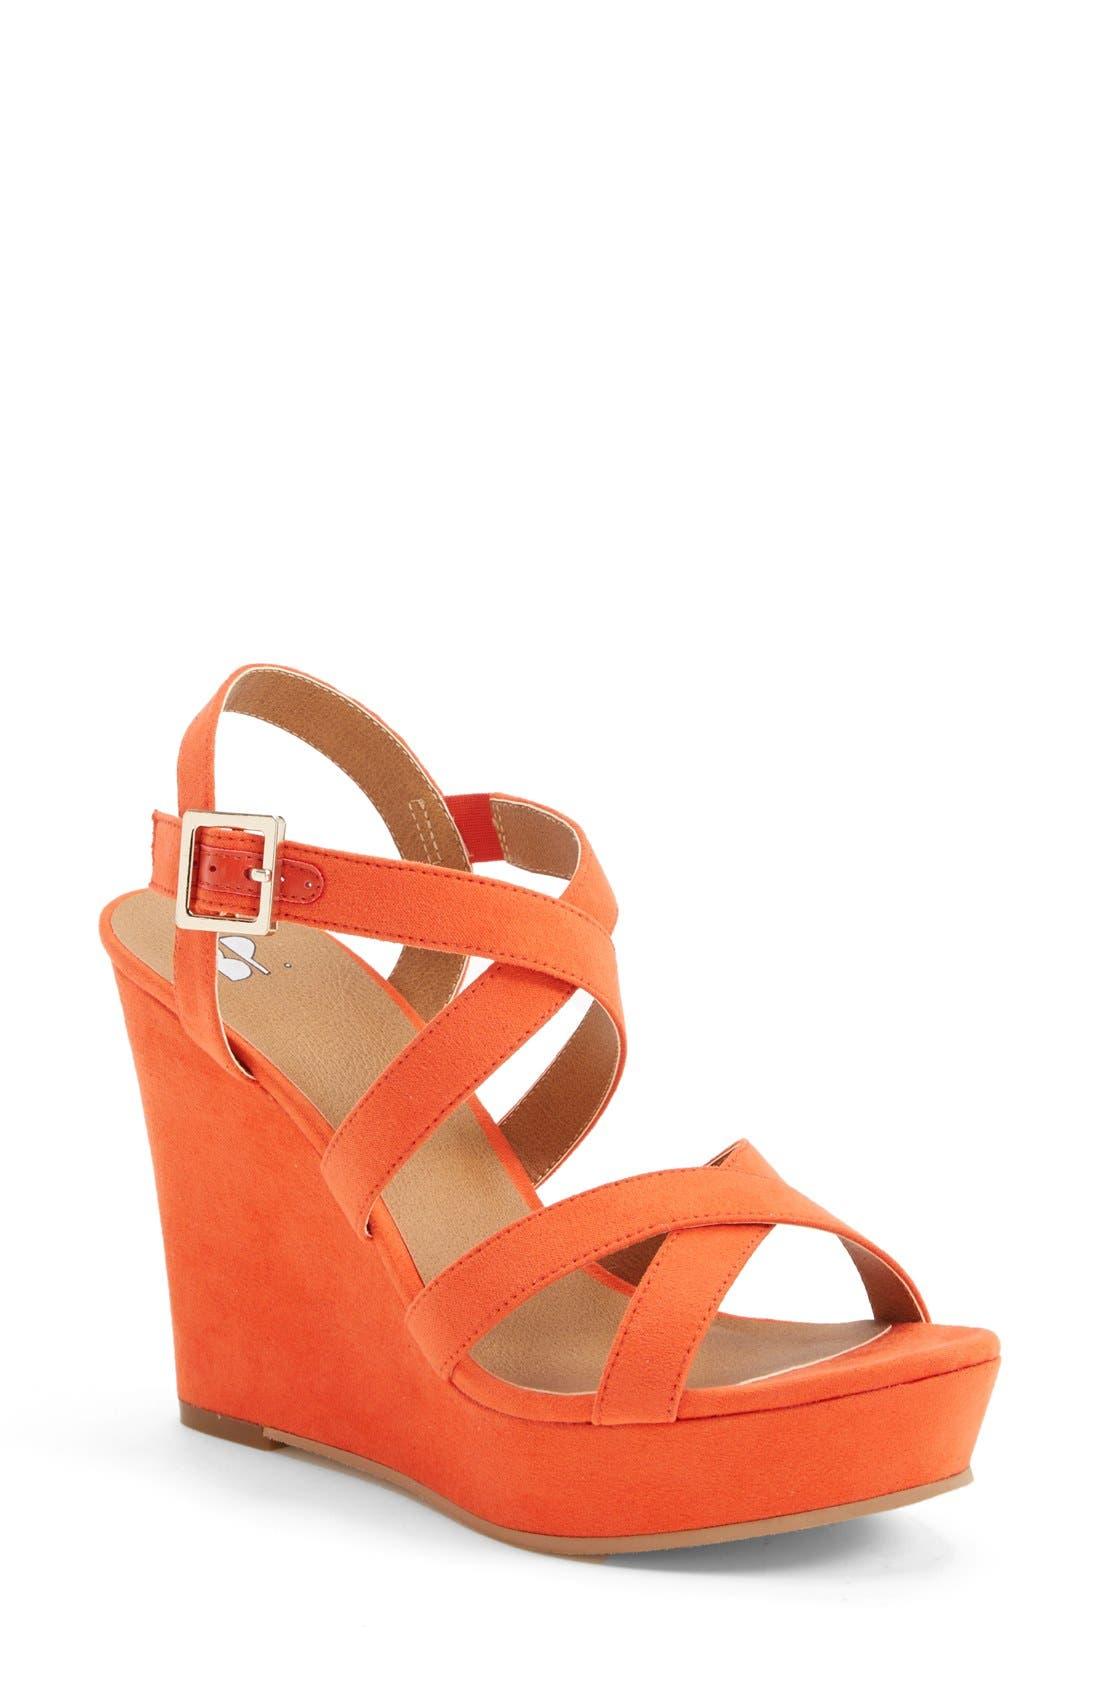 Main Image - BP. 'Summers' Wedge Sandal (Women)